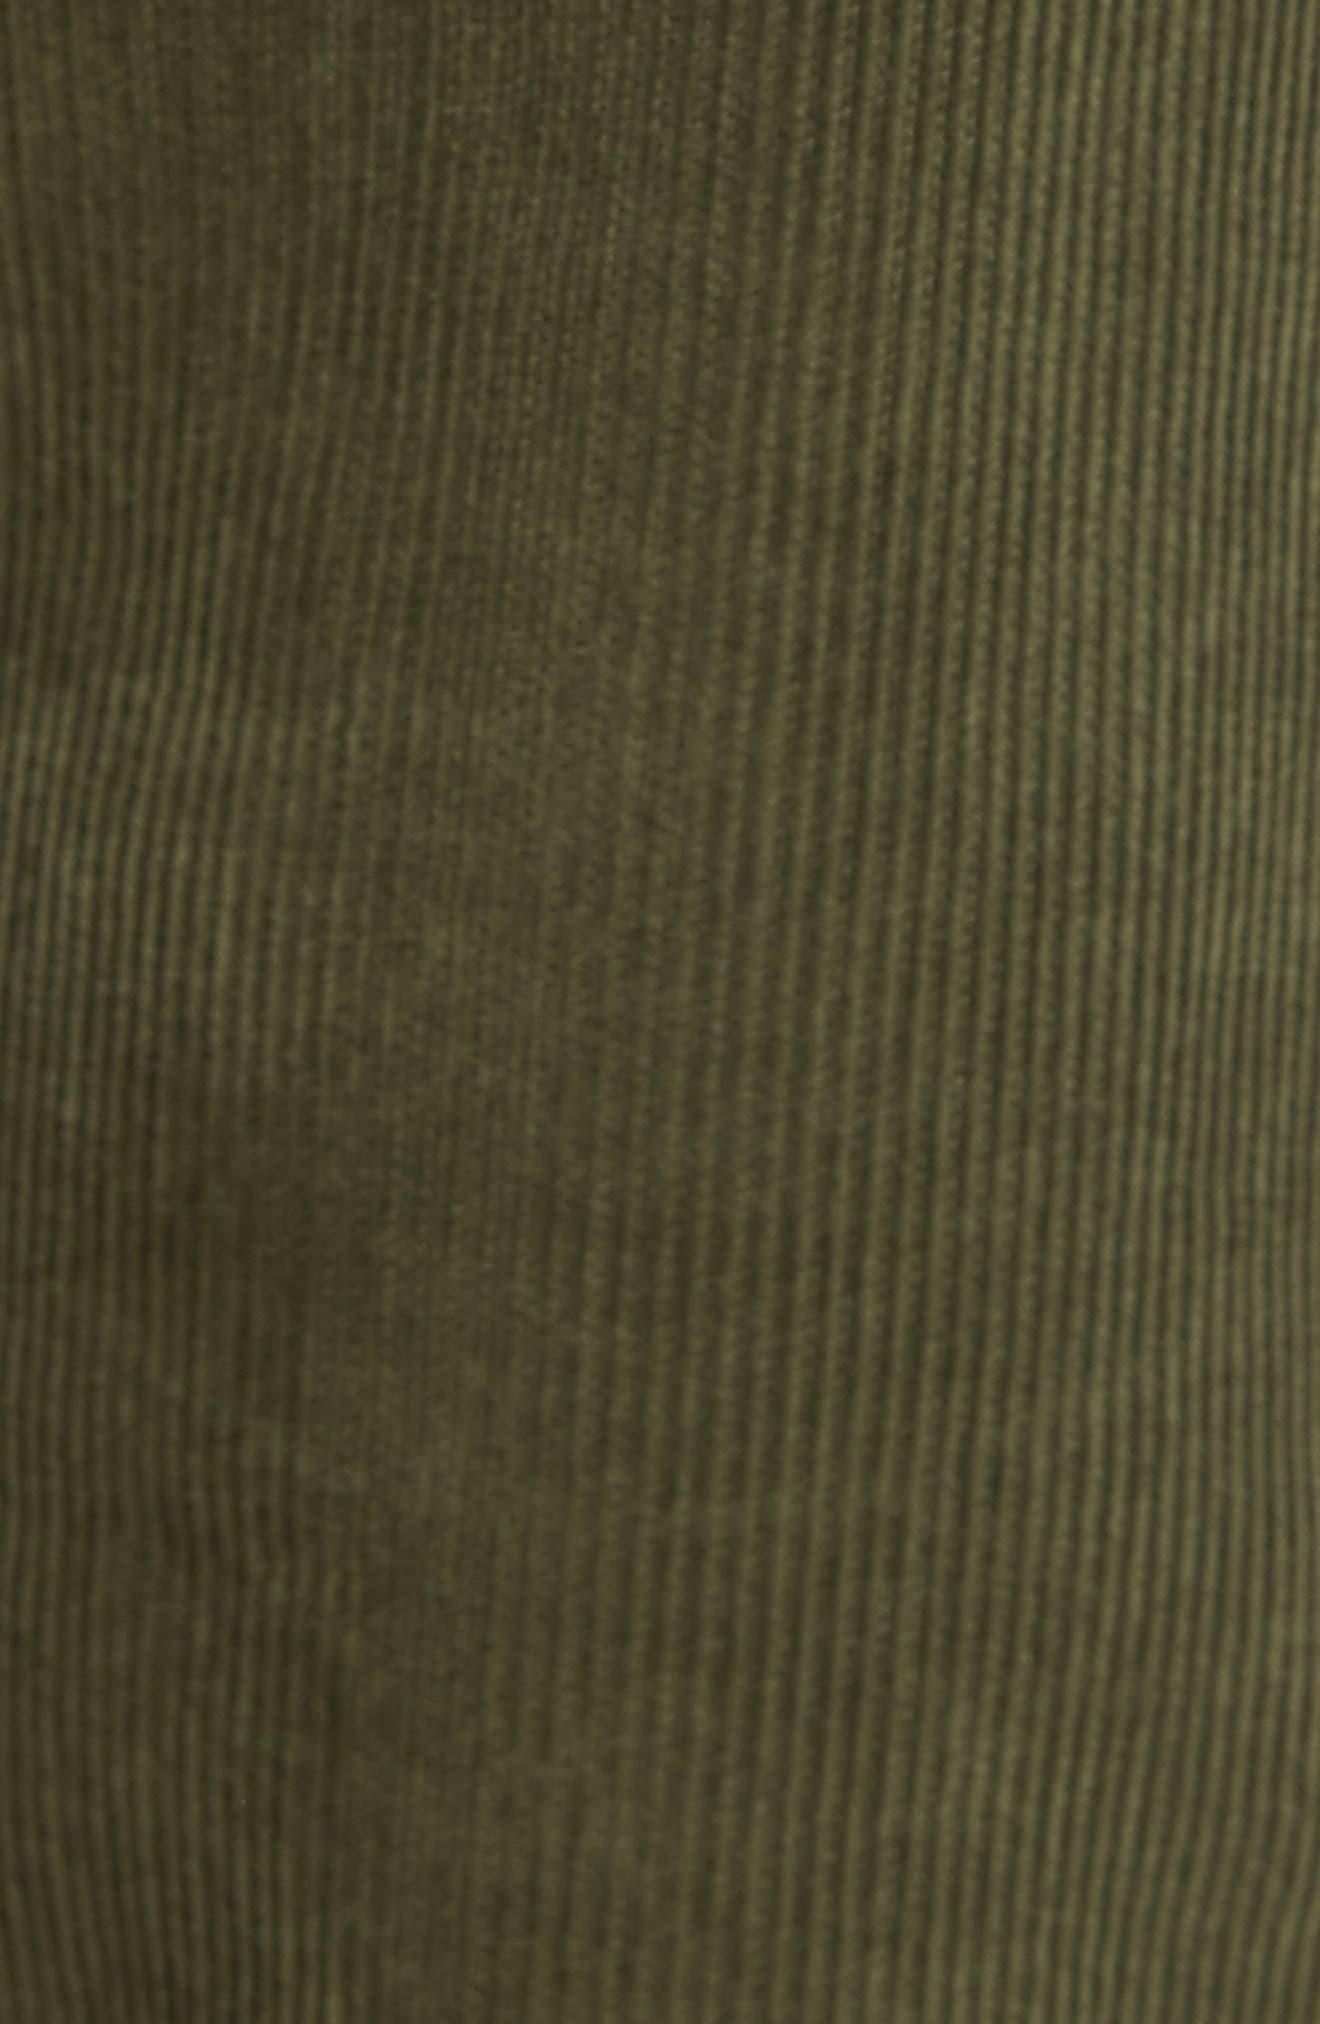 'Graduate' Tailored Straight Leg Corduroy Pants,                             Alternate thumbnail 5, color,                             Sulfur Climbing Ivy